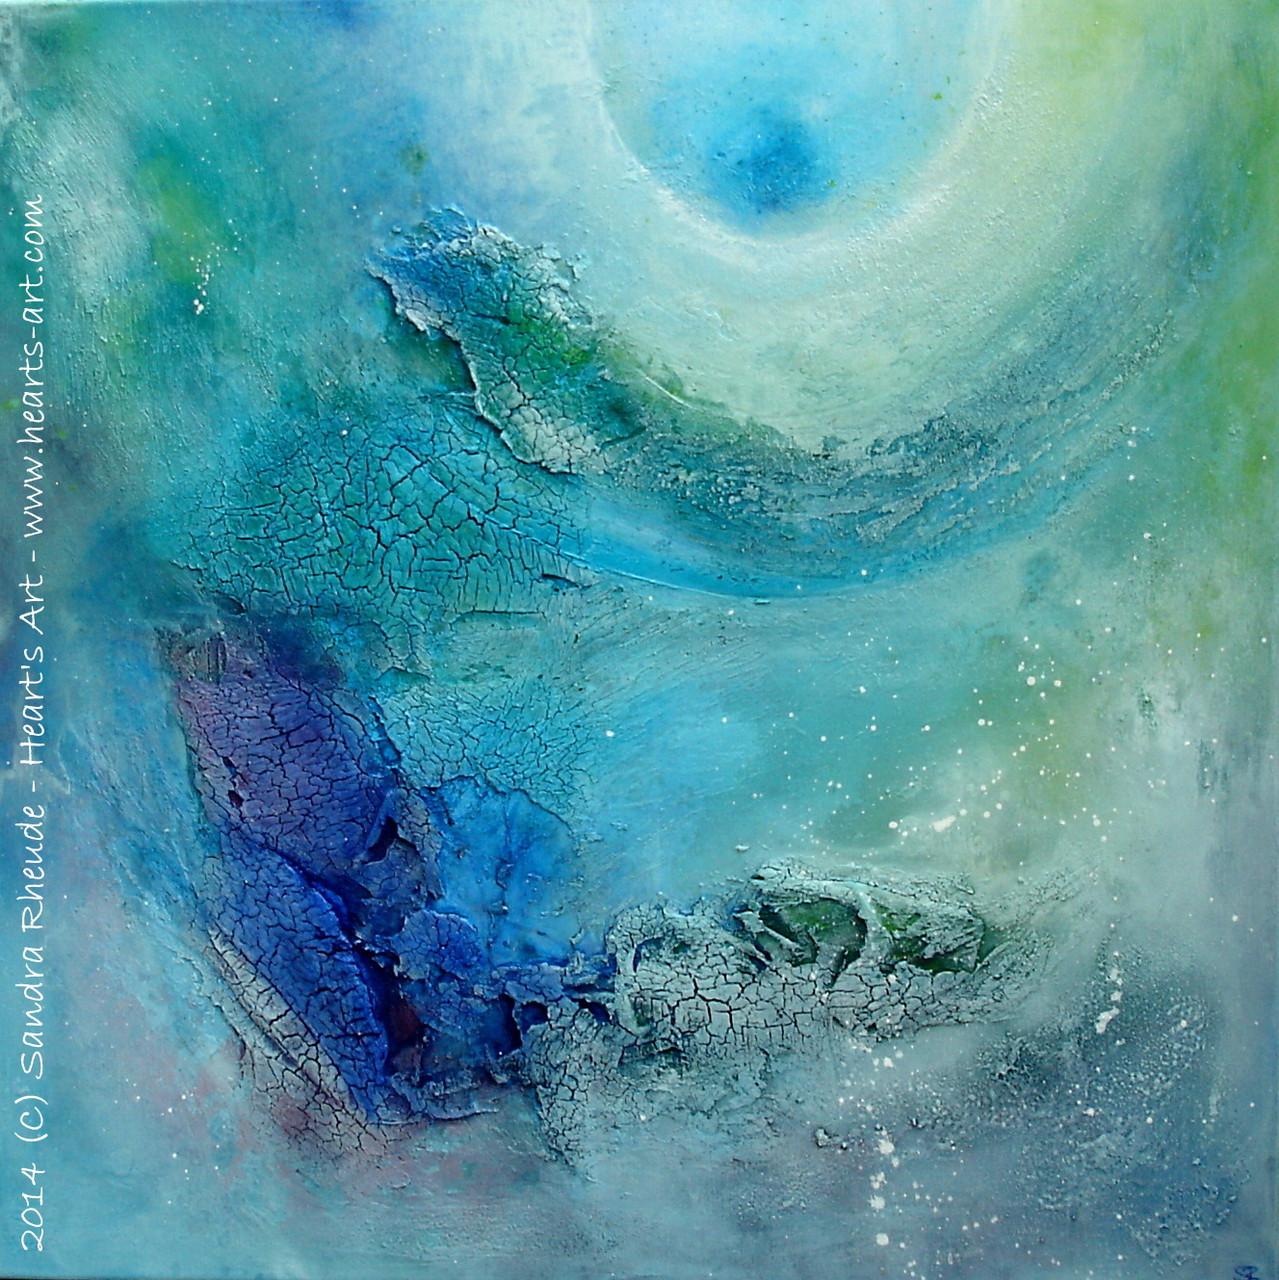 'Mermaid' - 2014/37 - Acryl/MixedMedia auf Leinwand - 70 x 70 cm - verkauft (Bayern) - 2. Platz beim Fairkunst Award 2014